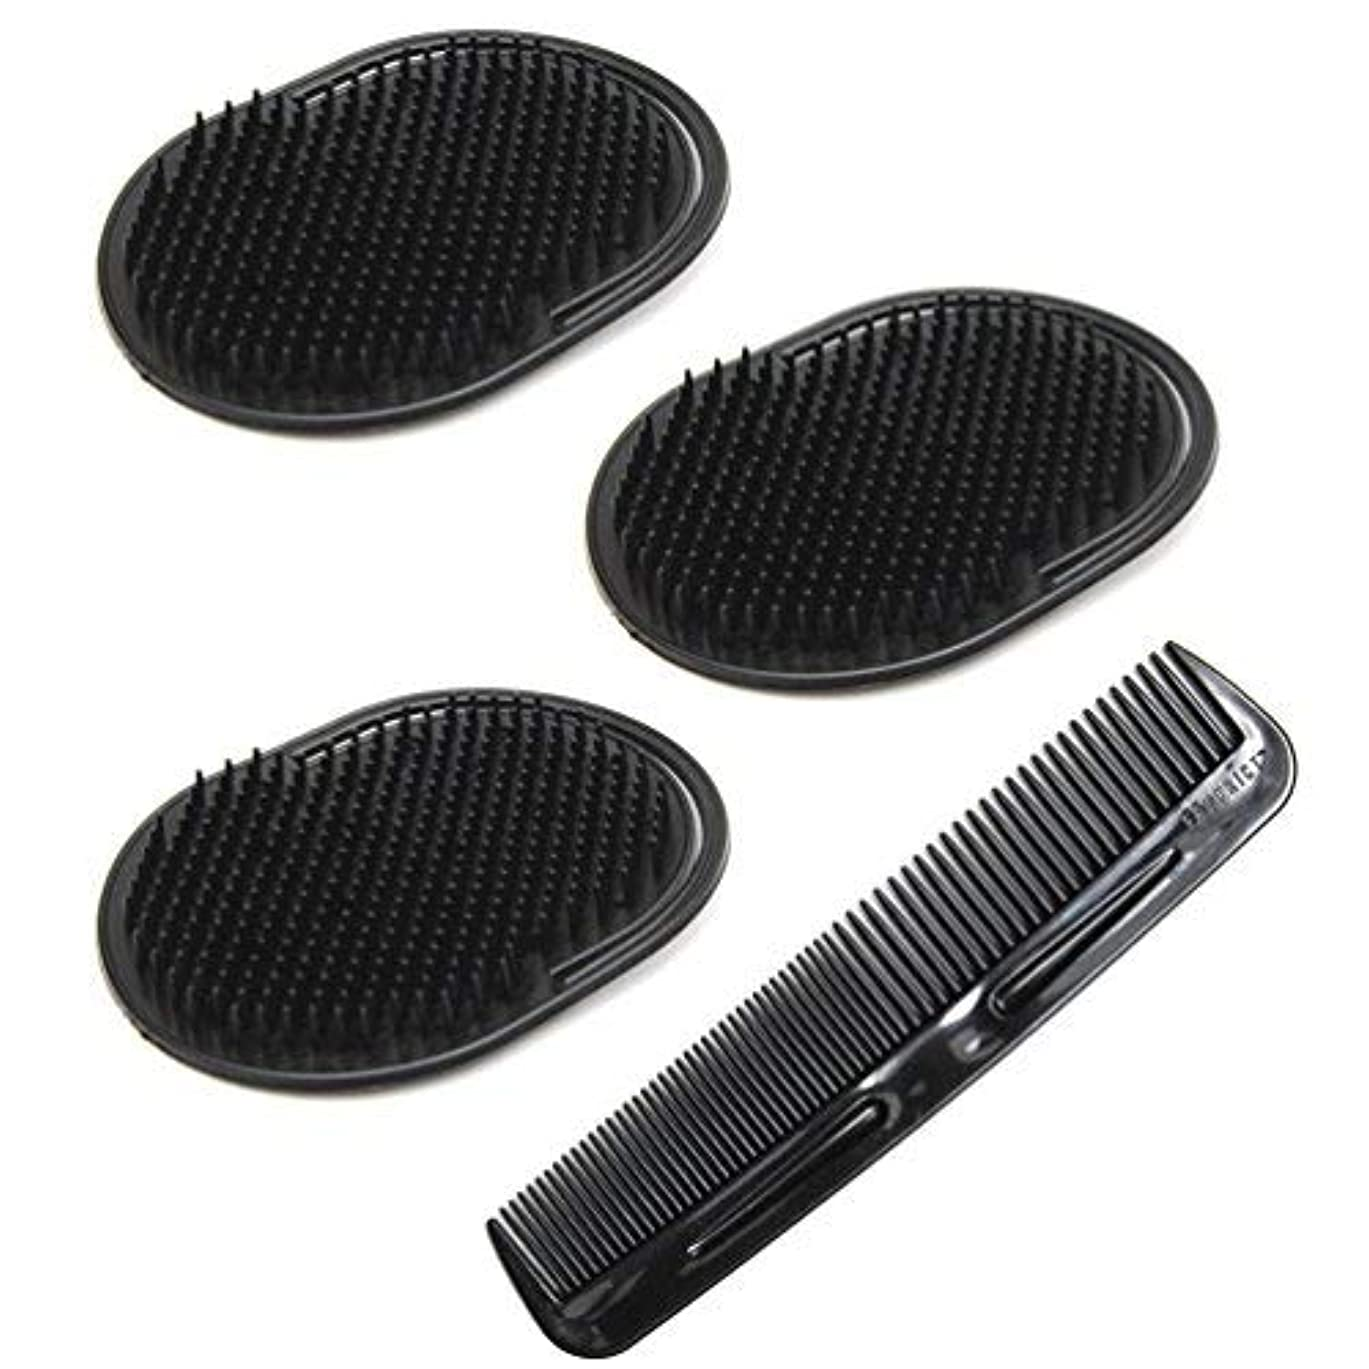 爪概要復讐Luxxii (4 Pack) Hair Scalp Massage Shampoo Palm Brush Massager with 5